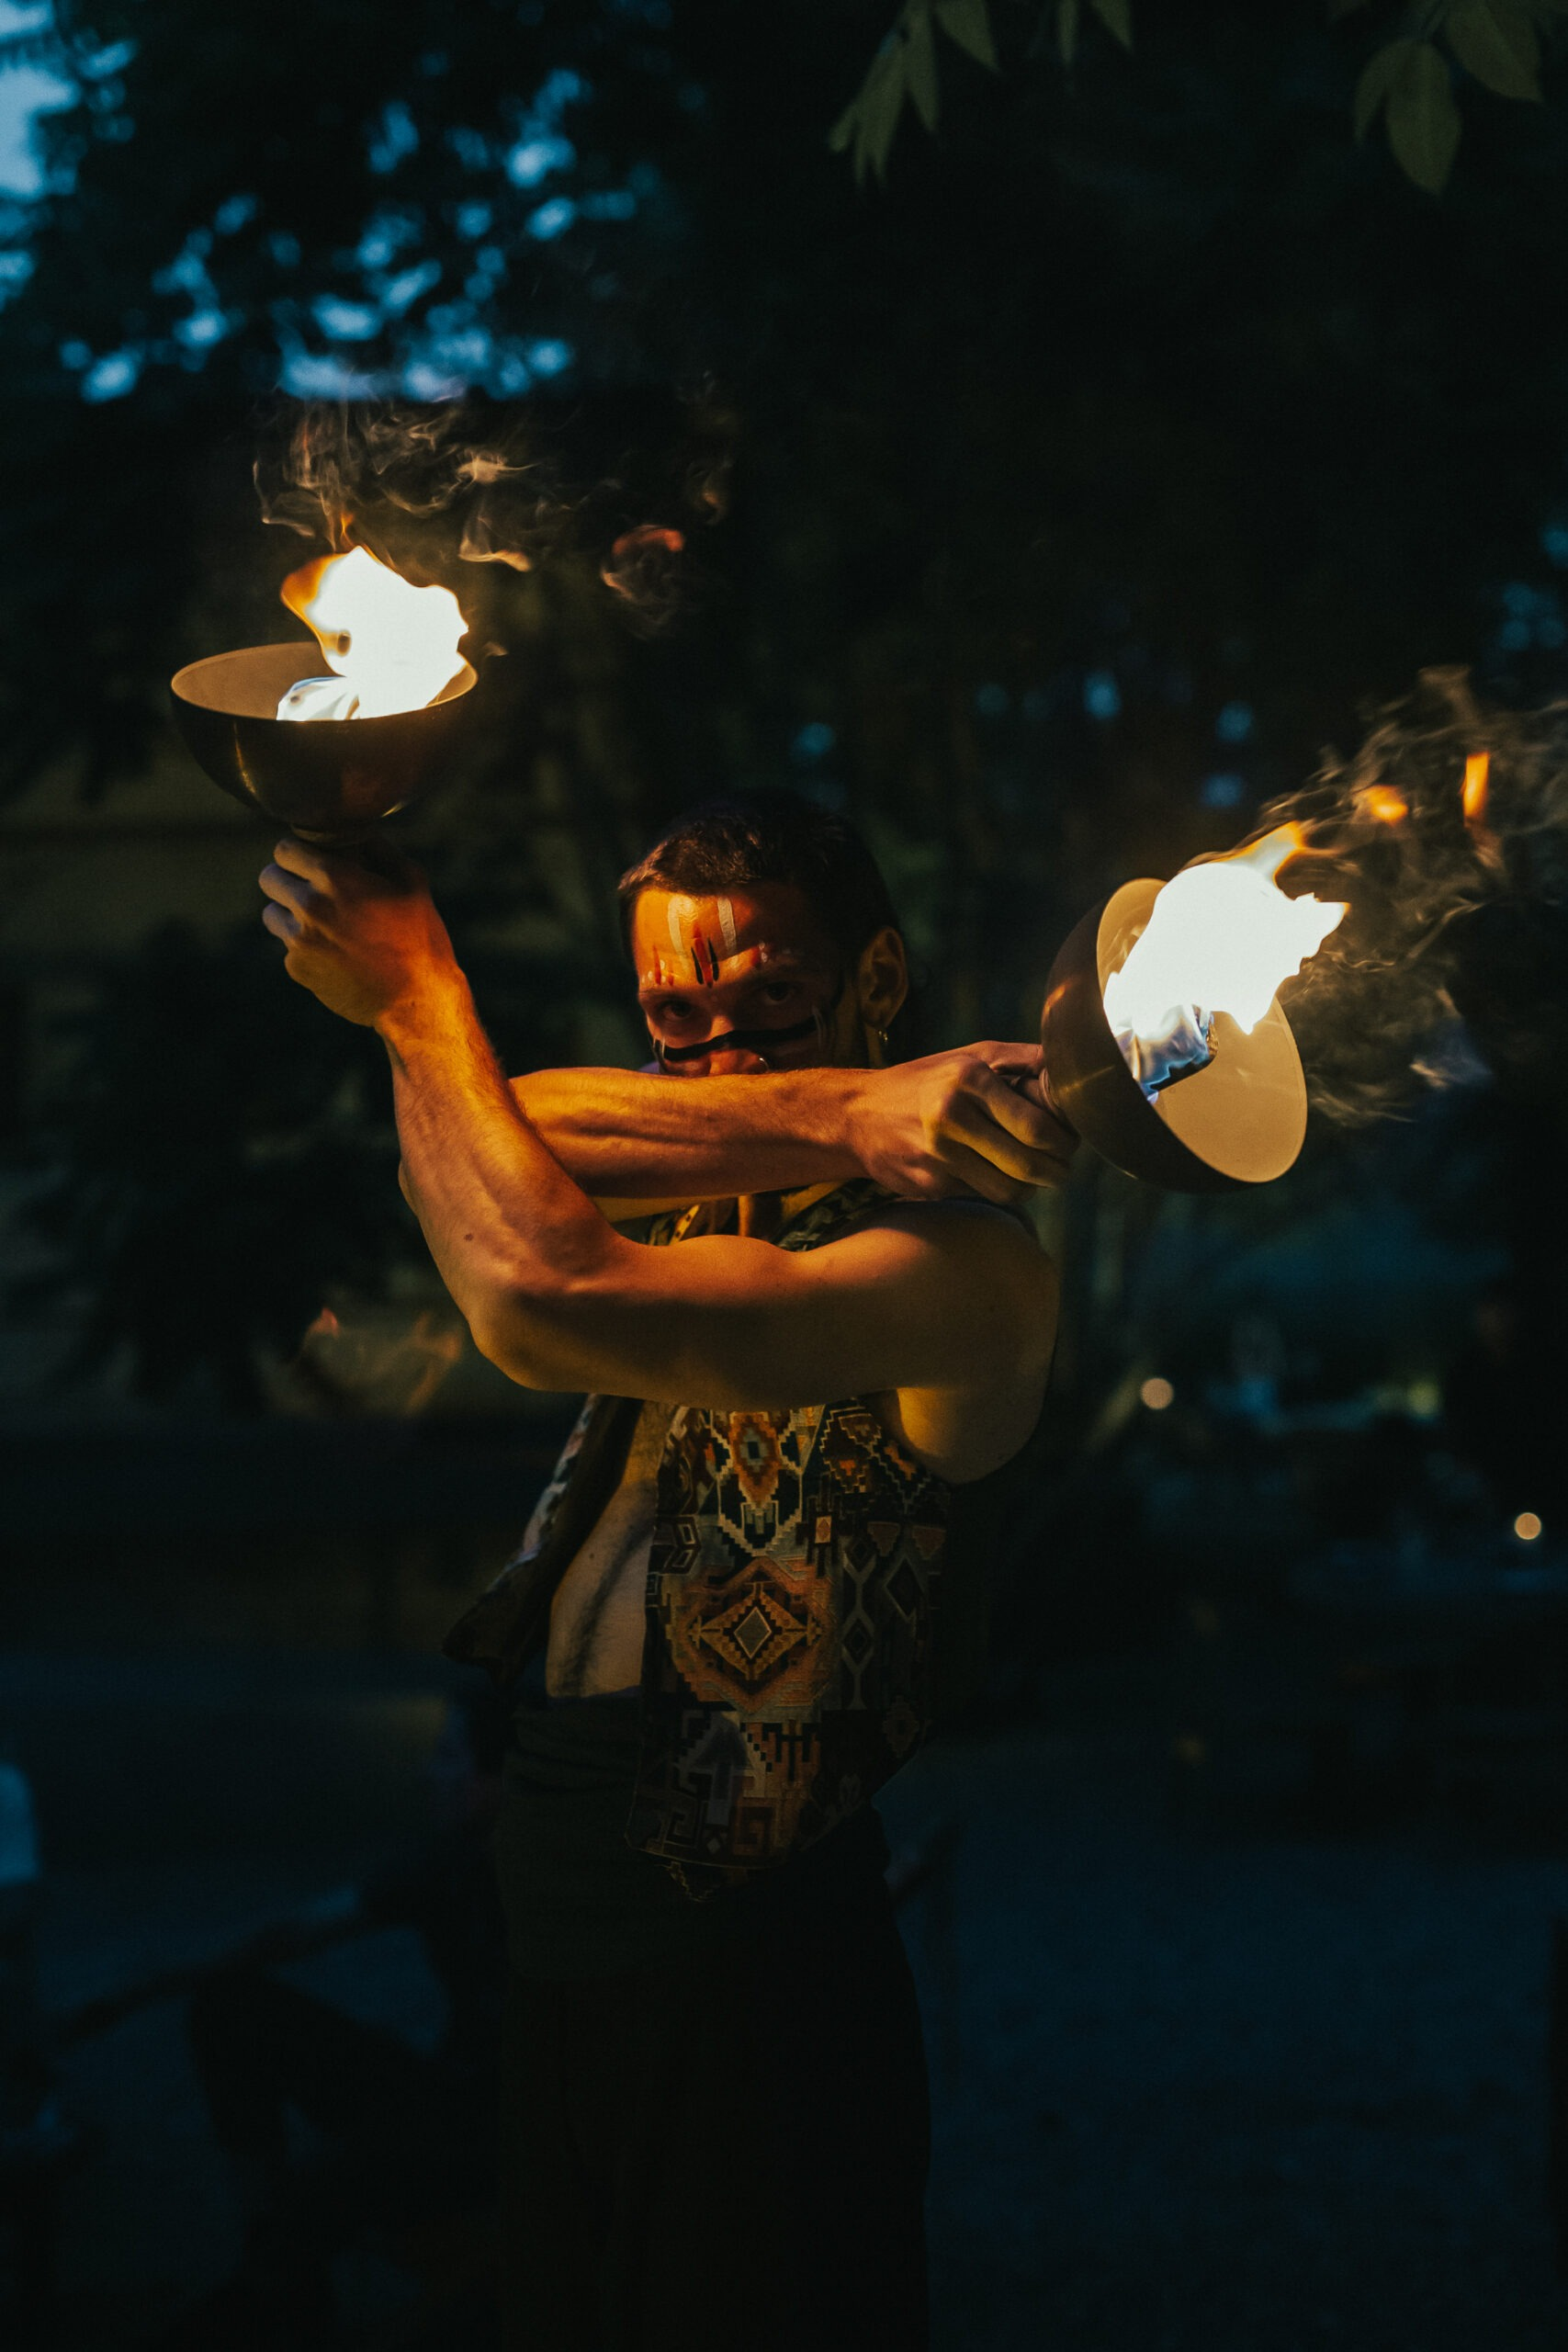 Nicola Colleoni Performarte – The Sanctuary Eco Reatreat Milano – performer – fire dancer – artist